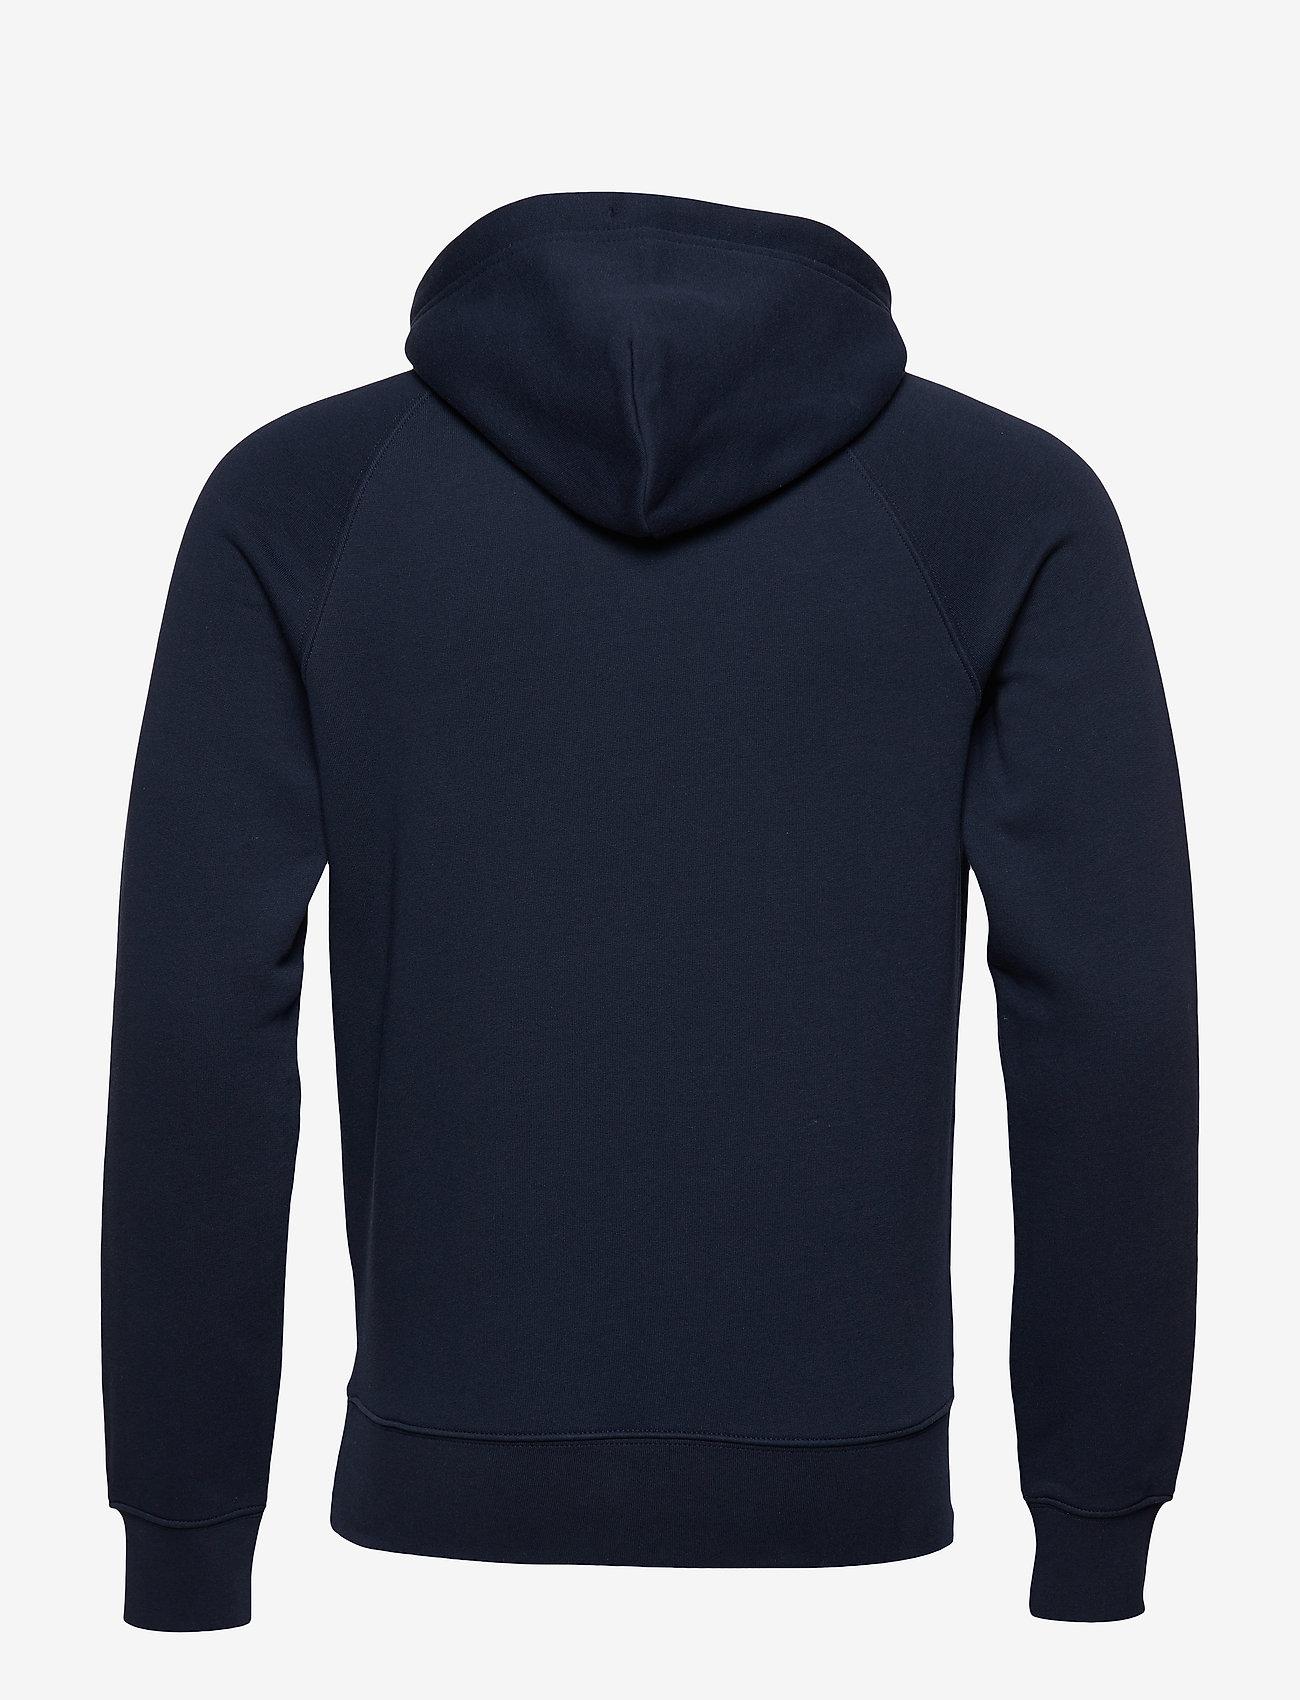 GANT - SHIELD HOODIE - kapuzenpullover - evening blue - 1